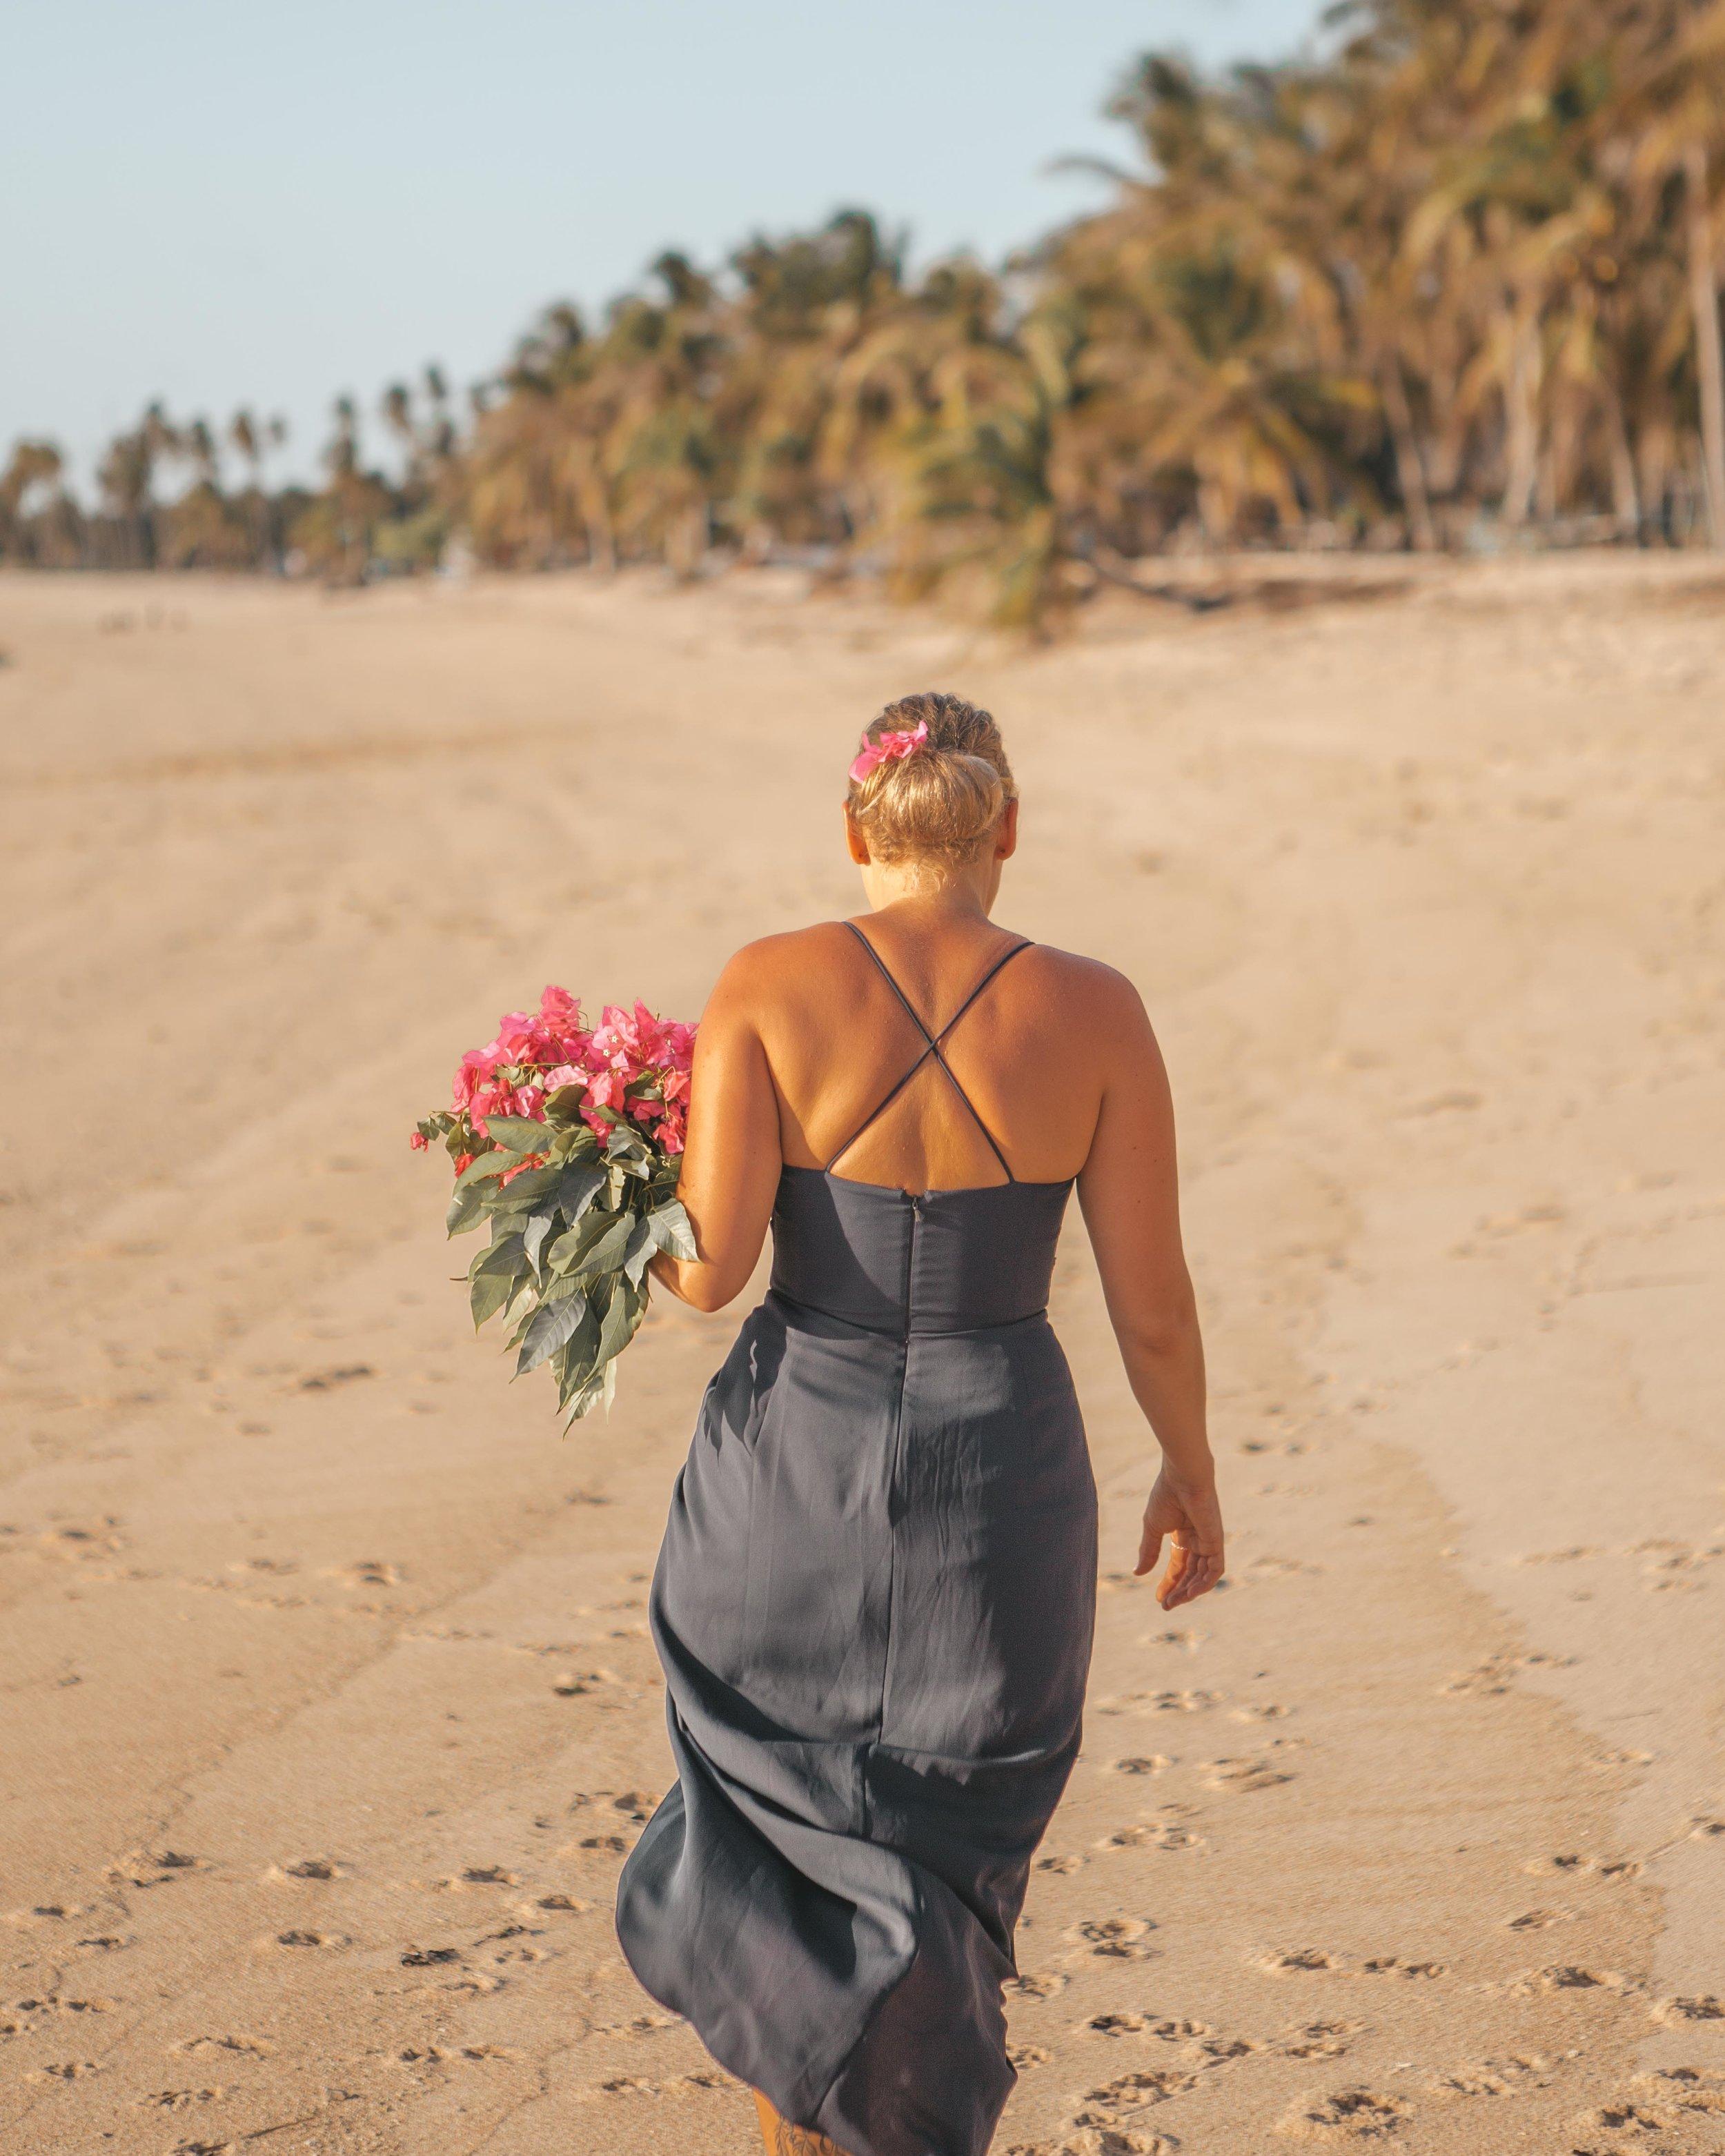 5-5-18 mitch and Hedi wedding ig3 (1 of 1).jpg